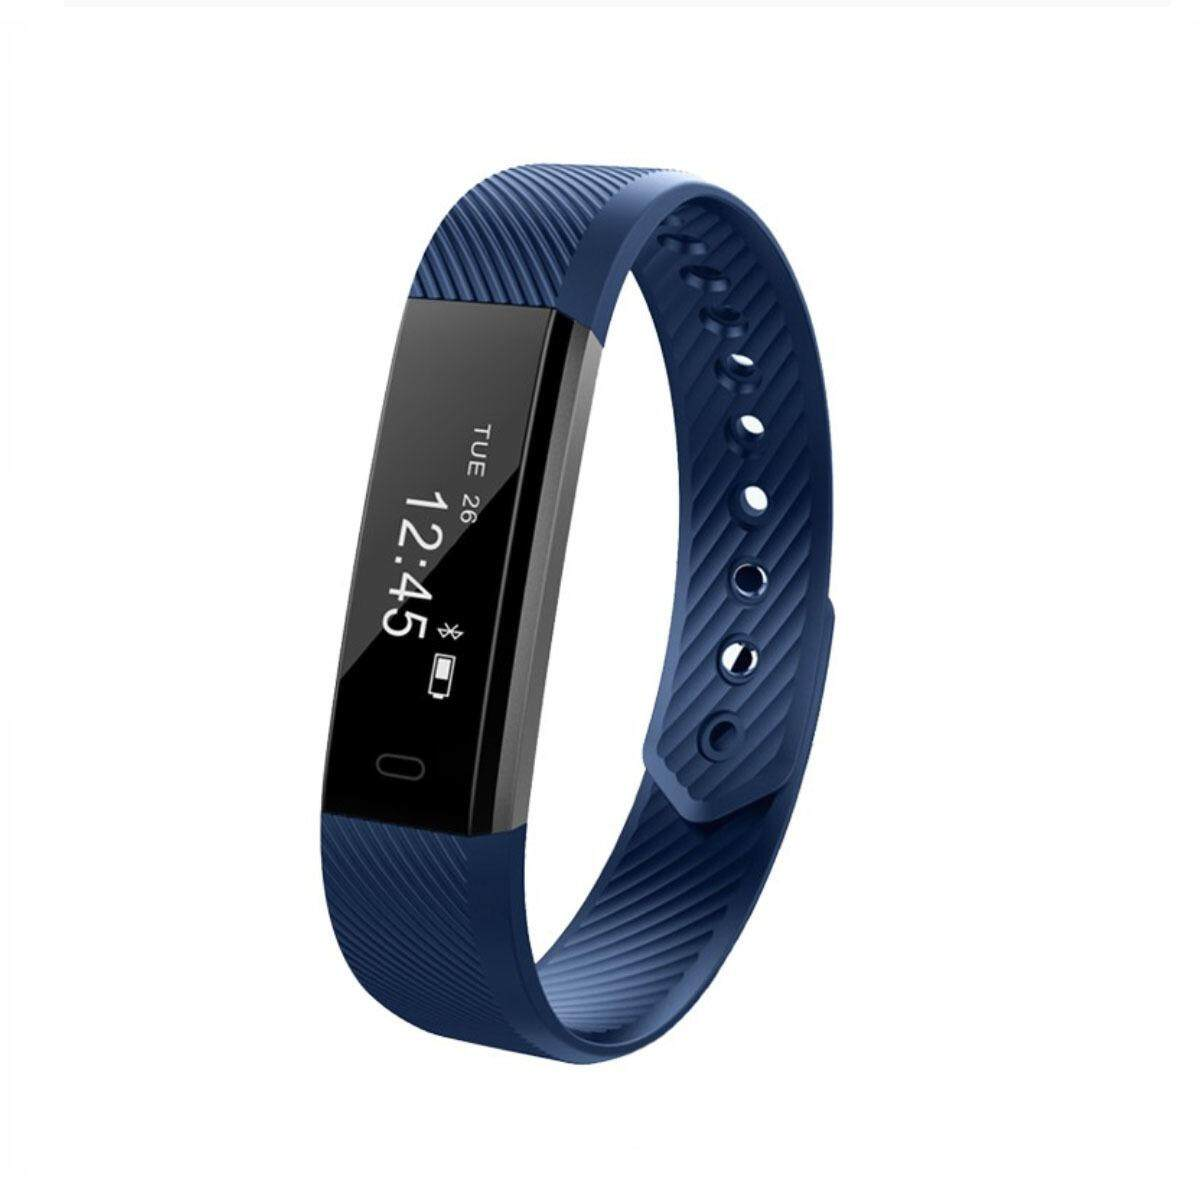 Tekkashop Xmas Gift ID115 PRO Fitness Tracker Smart Watch Wristband Smartband (Android/IOS), Dark Blue